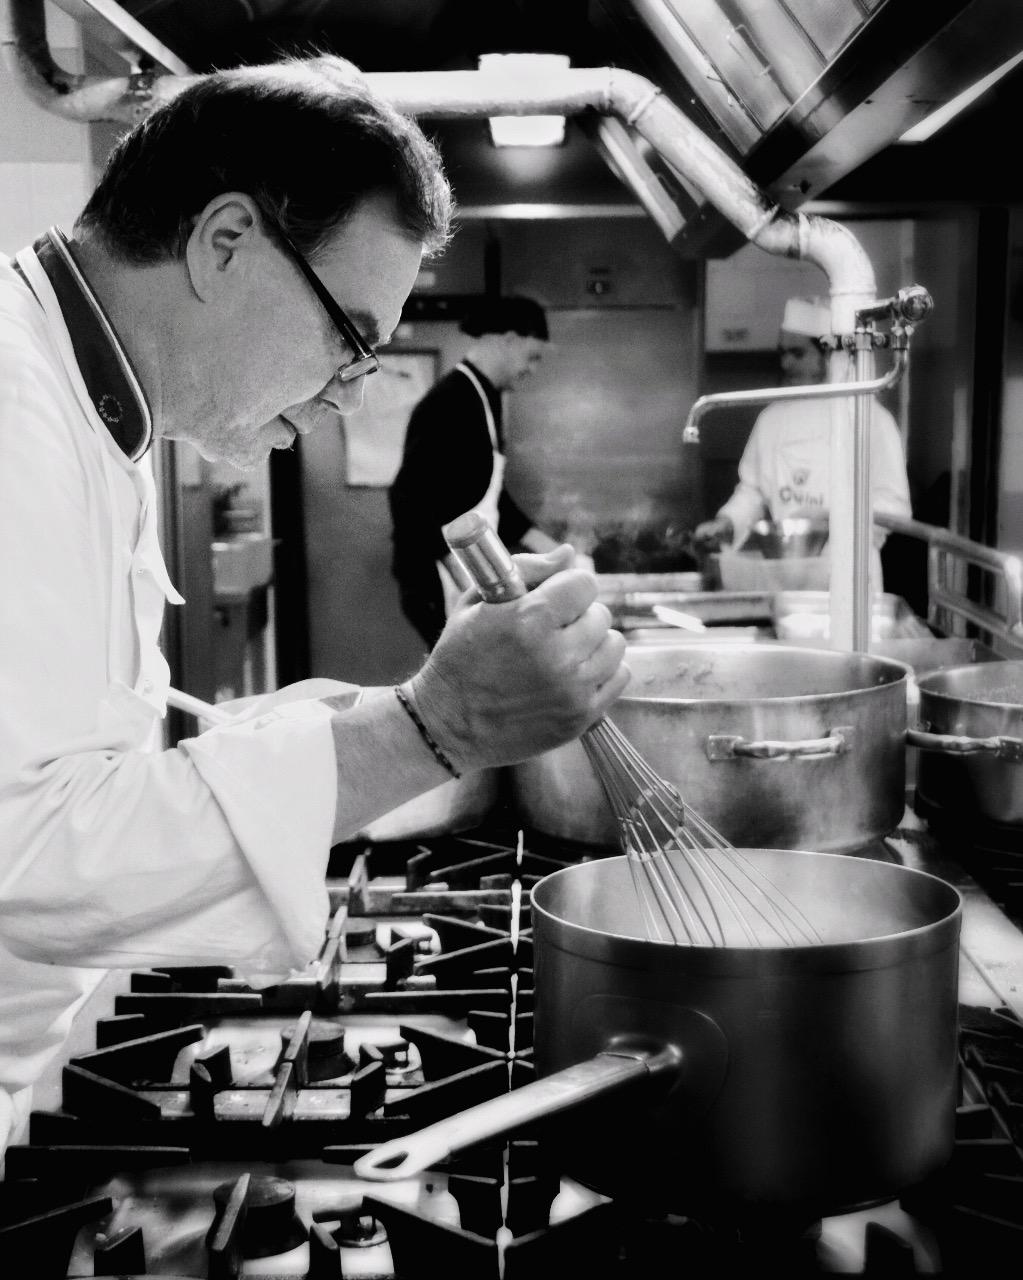 Sapori toscani sapientemente elaborati da Chef Ragoni